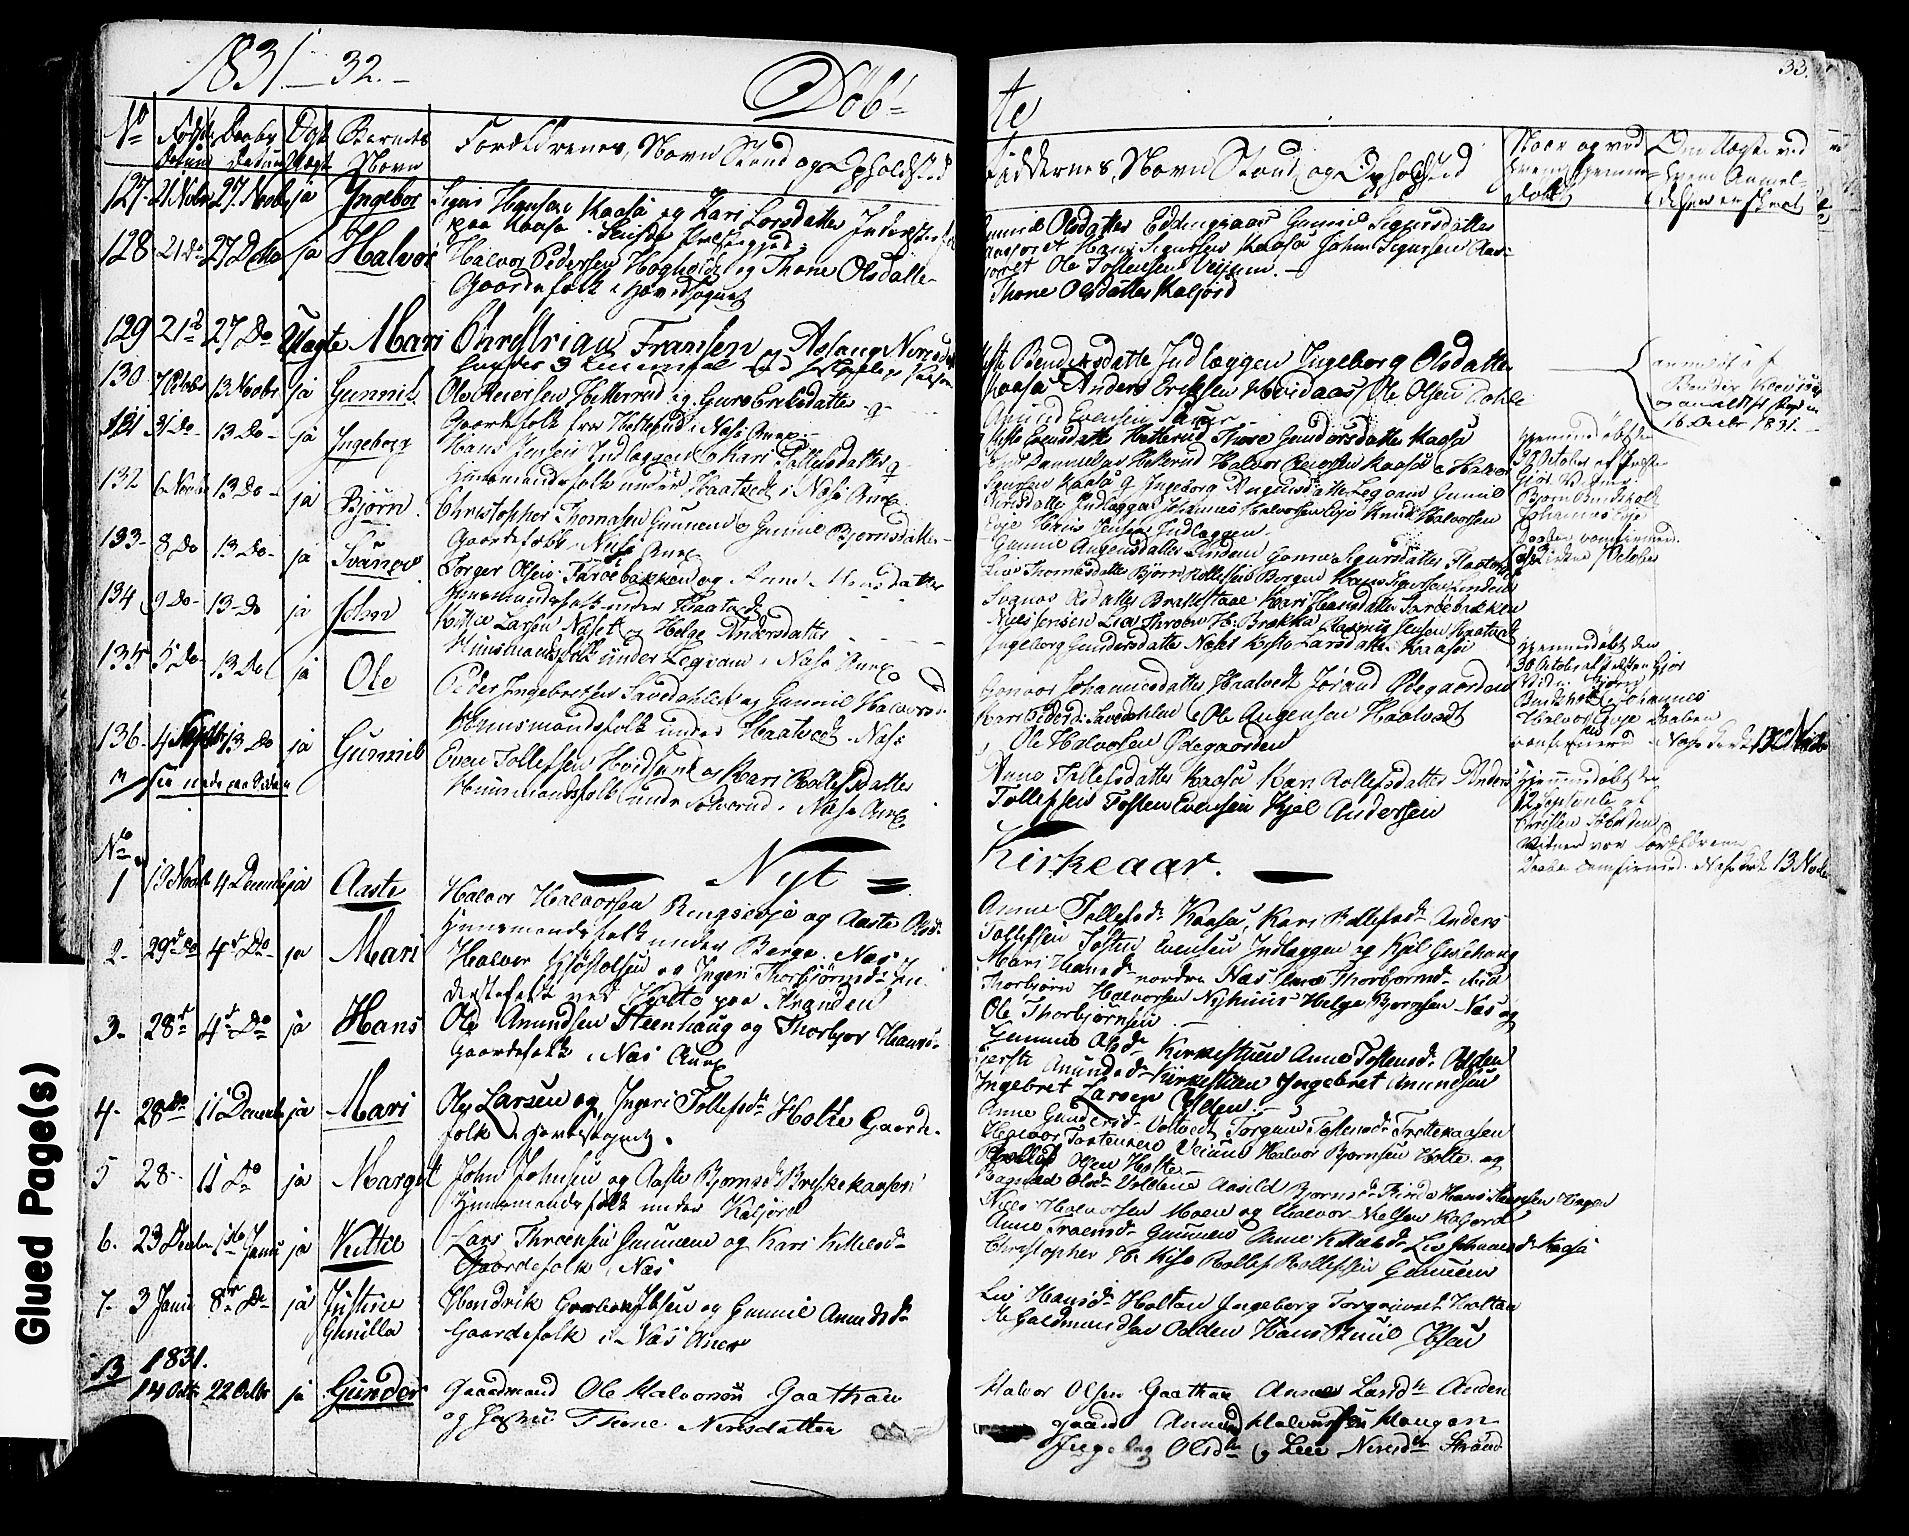 SAKO, Sauherad kirkebøker, F/Fa/L0006: Ministerialbok nr. I 6, 1827-1850, s. 33